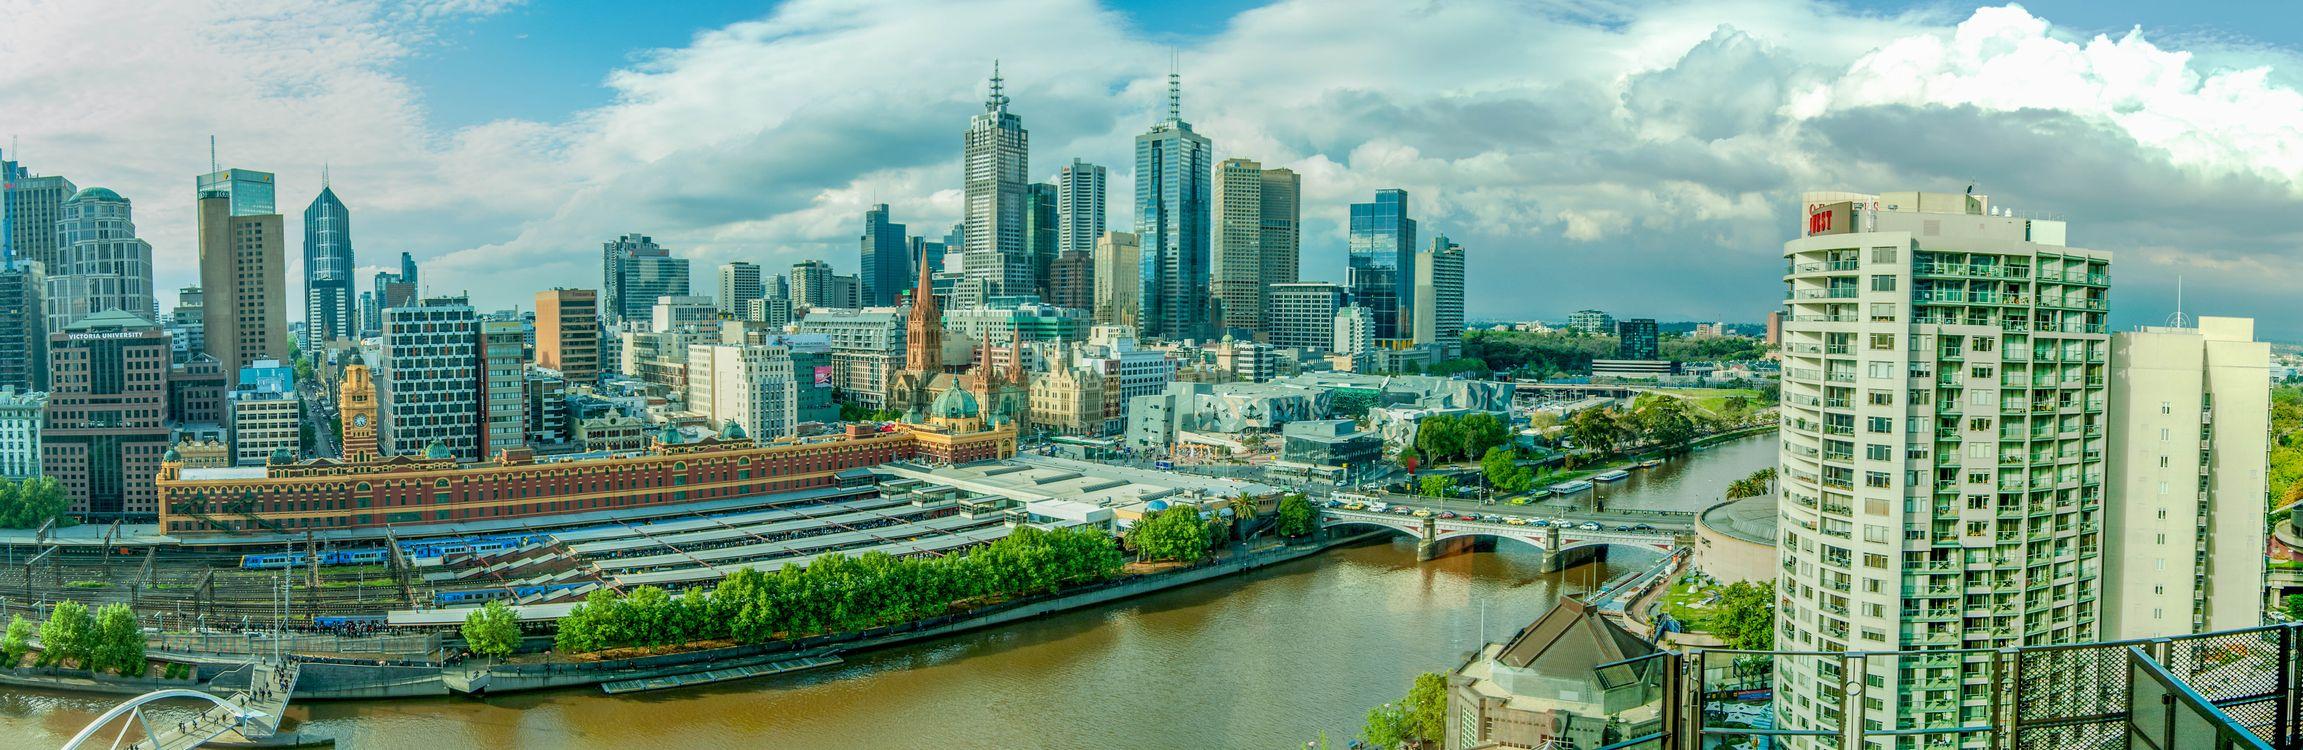 Фото бесплатно Melbourne, Australia, Мельбурн, Австралия, панорама, город